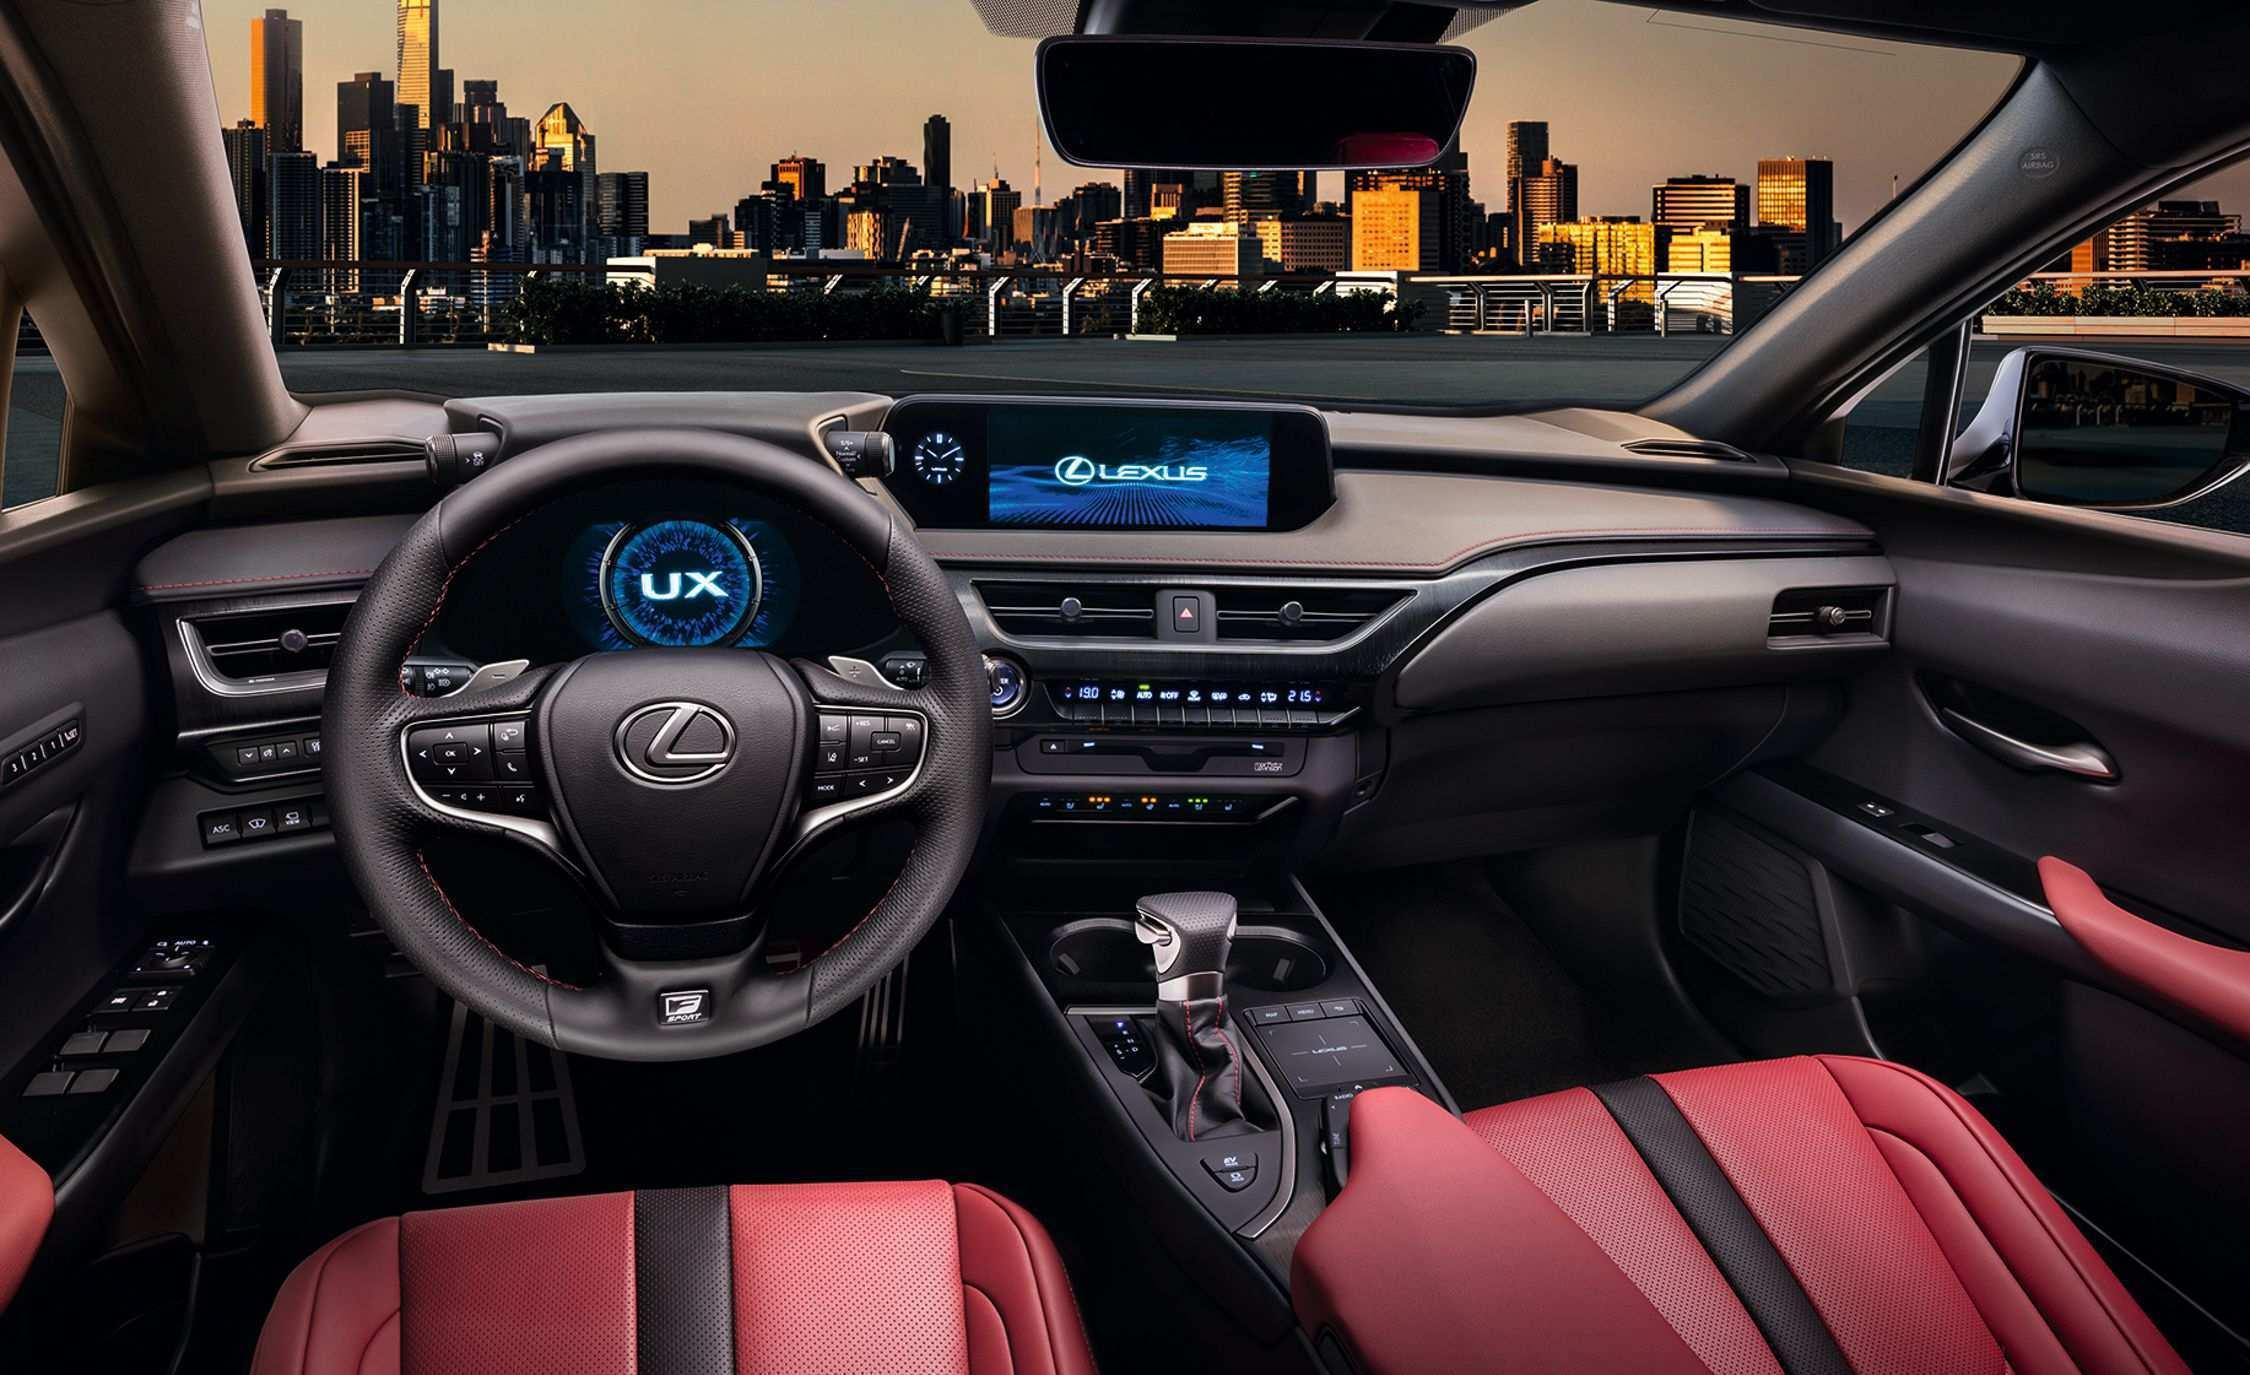 51 The Lexus Ux 2019 Price Picture by Lexus Ux 2019 Price